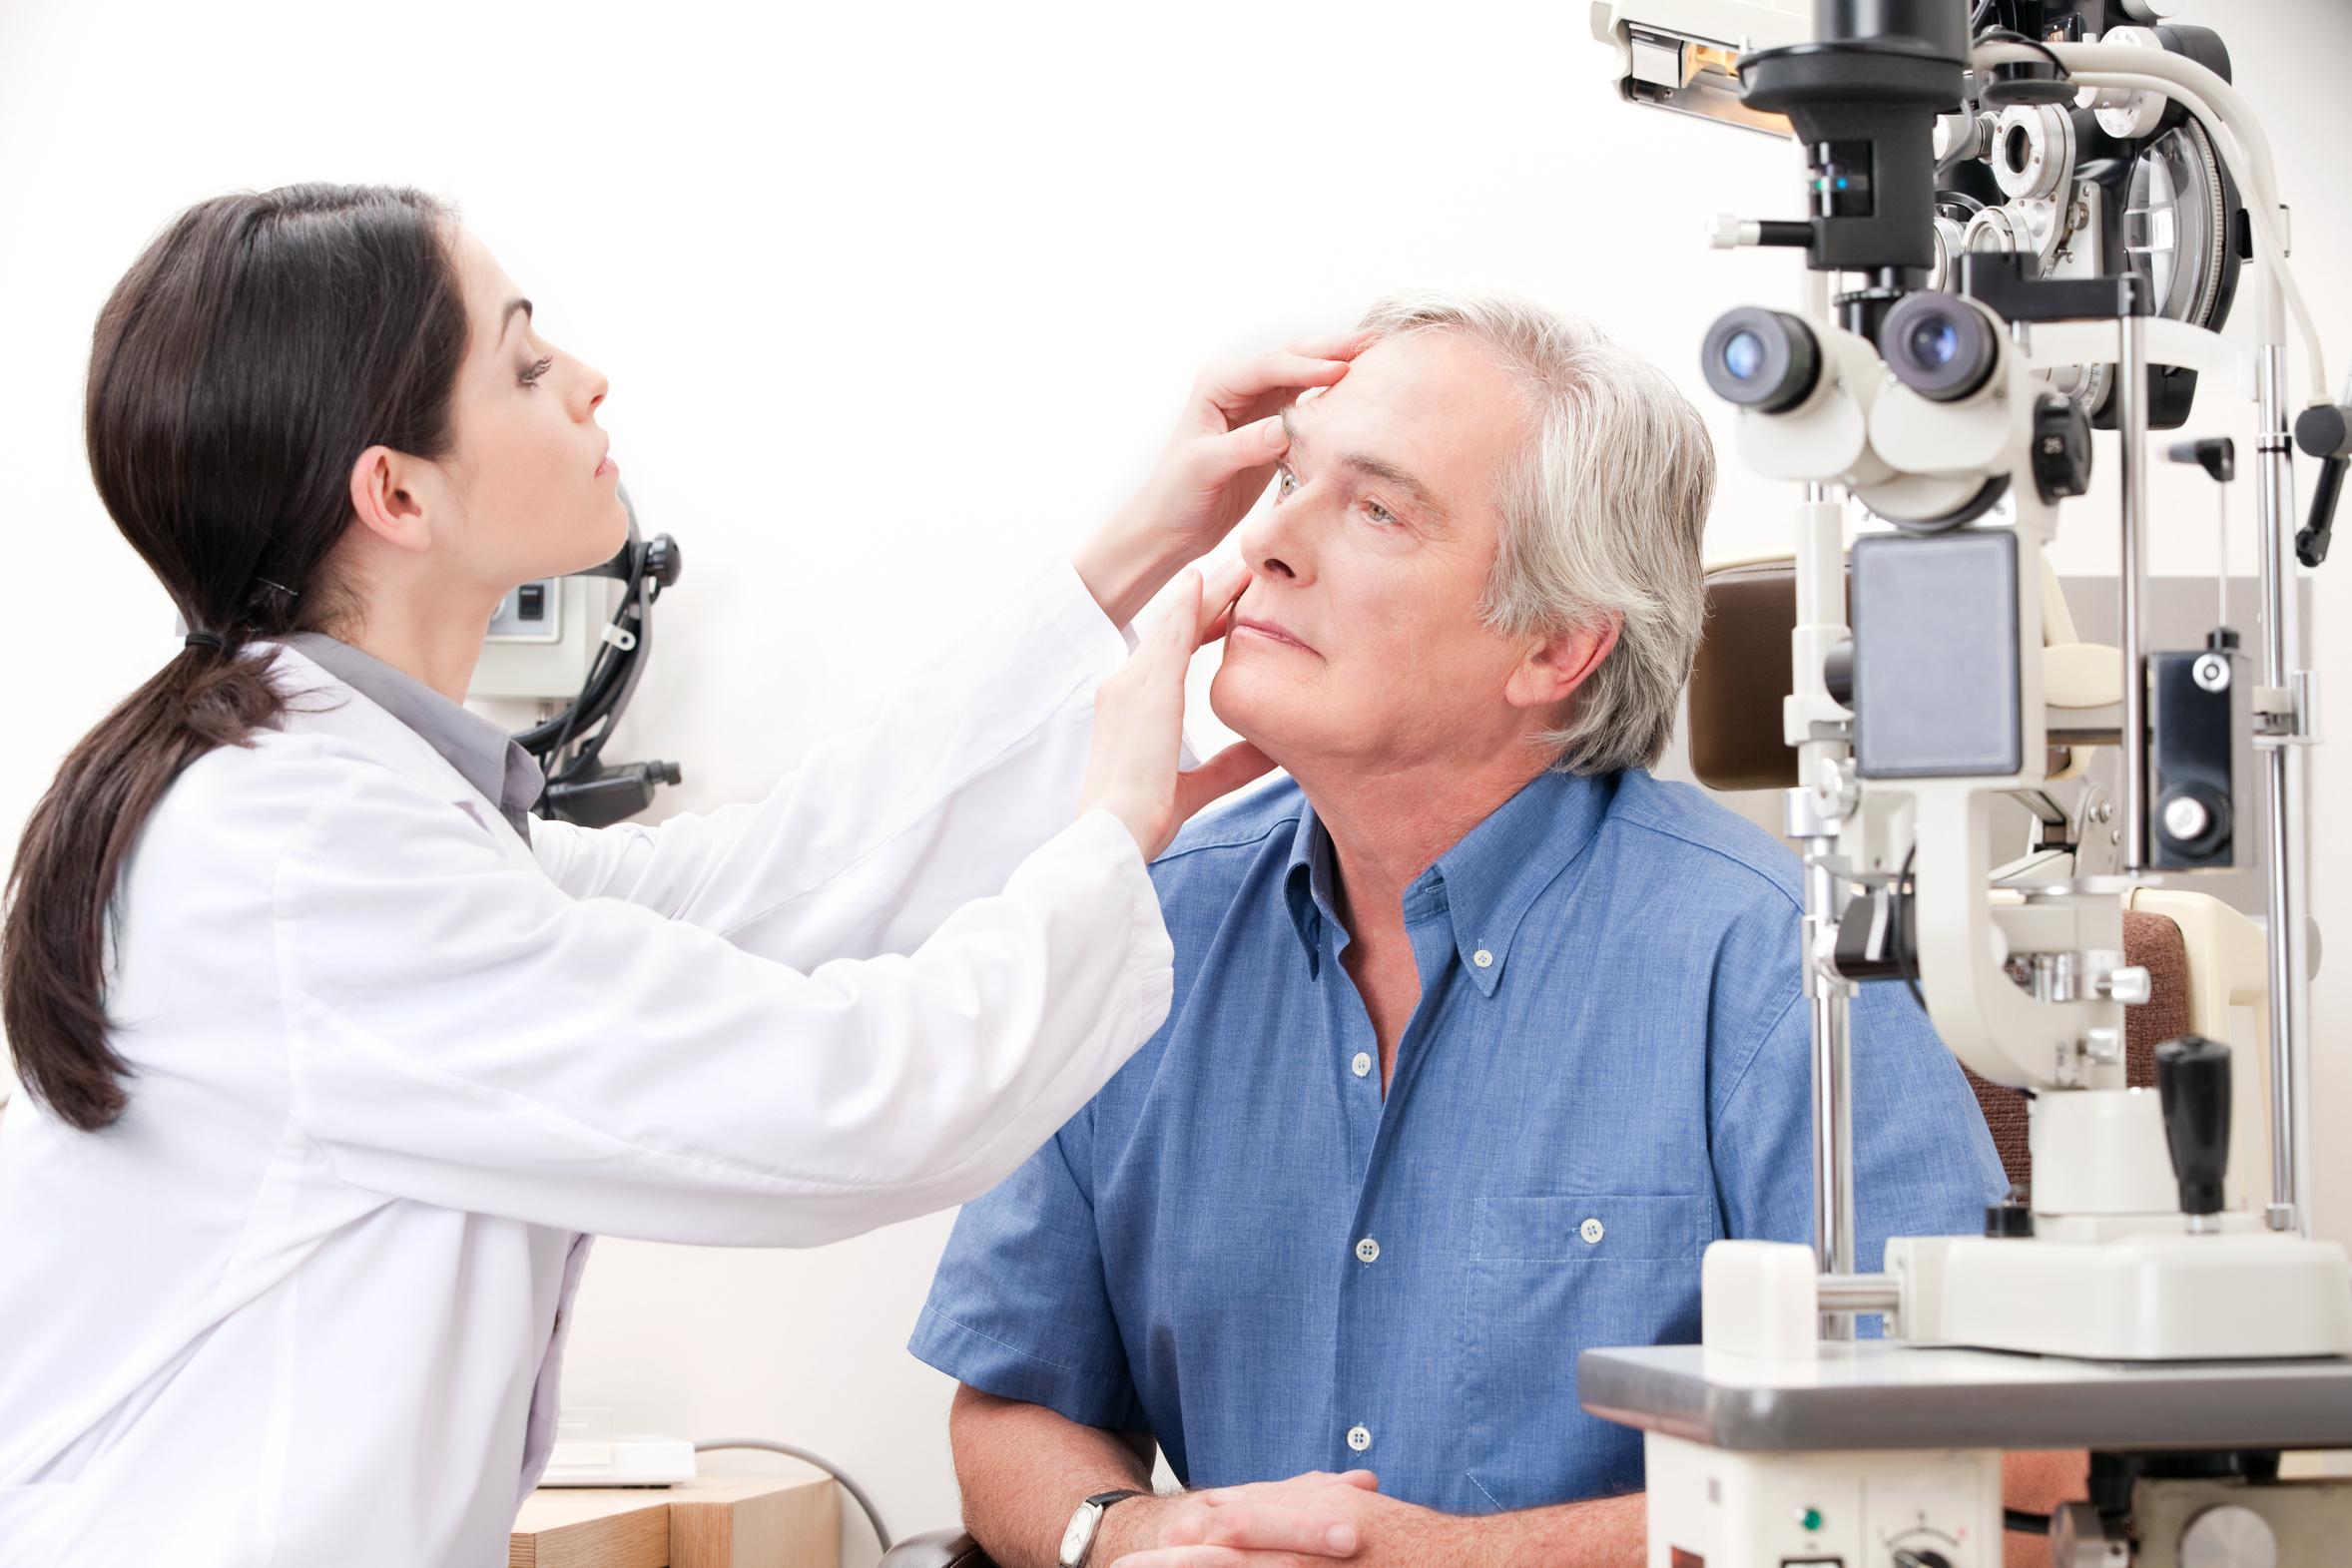 pediatric healthcare jobs